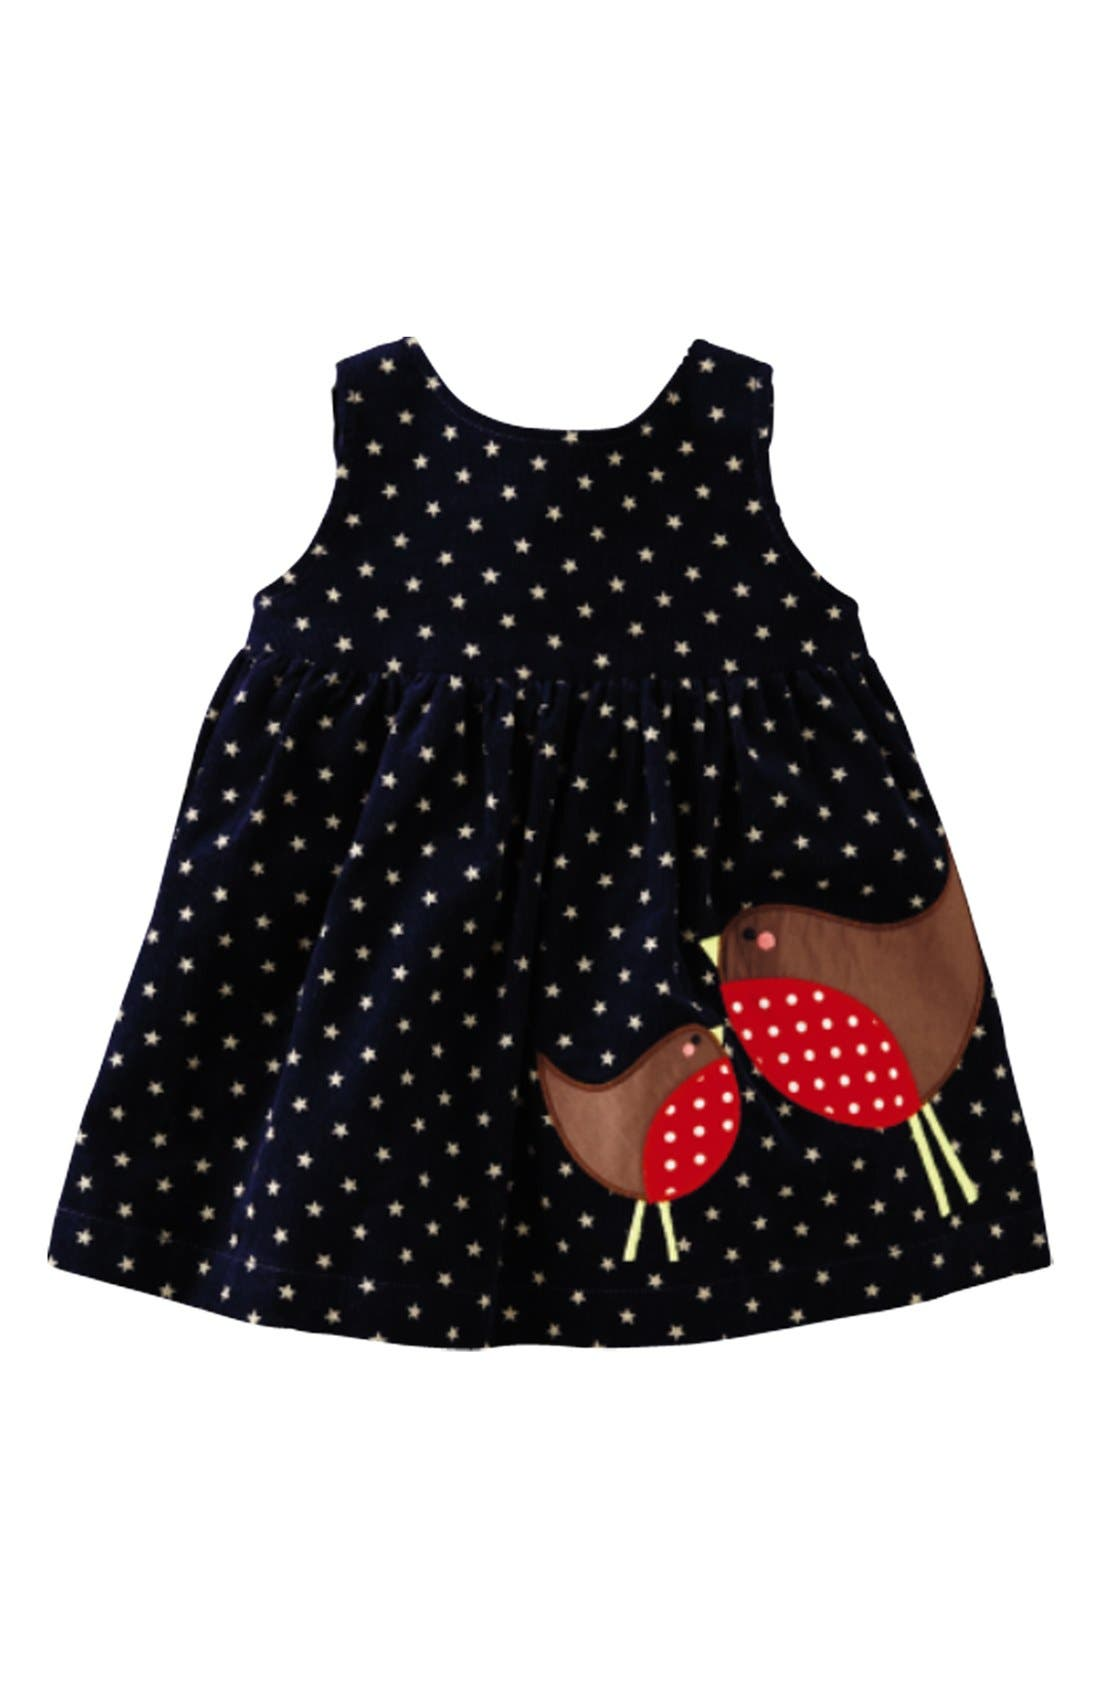 Alternate Image 1 Selected - Mini Boden Appliqué Dress (Baby Girls)